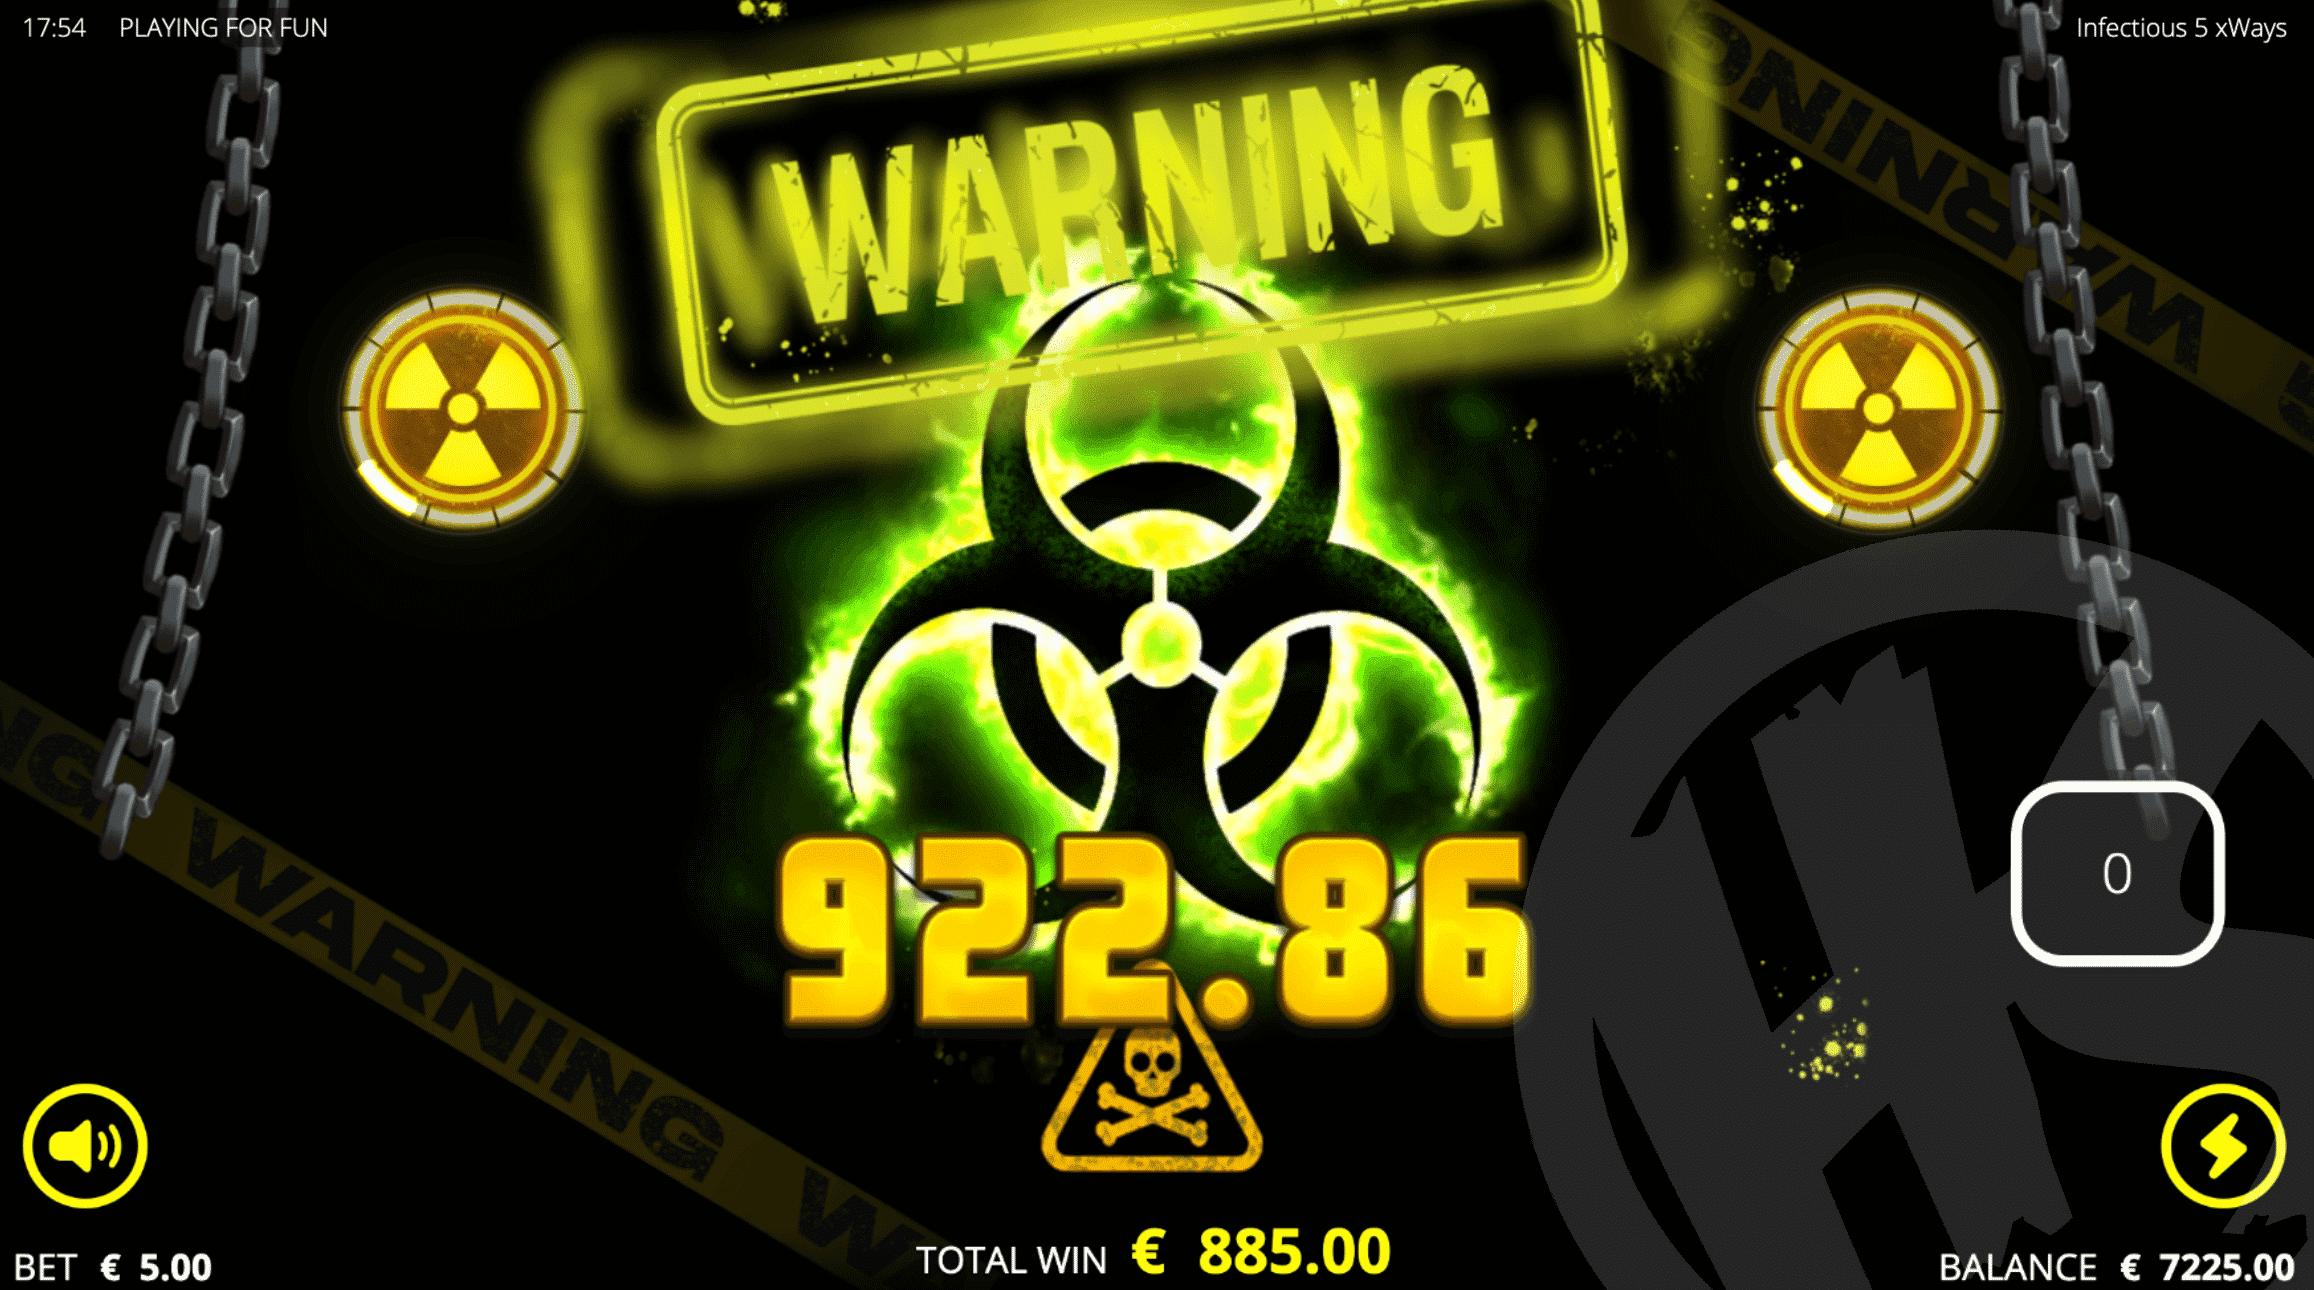 Infectious 5 xWays Big Win